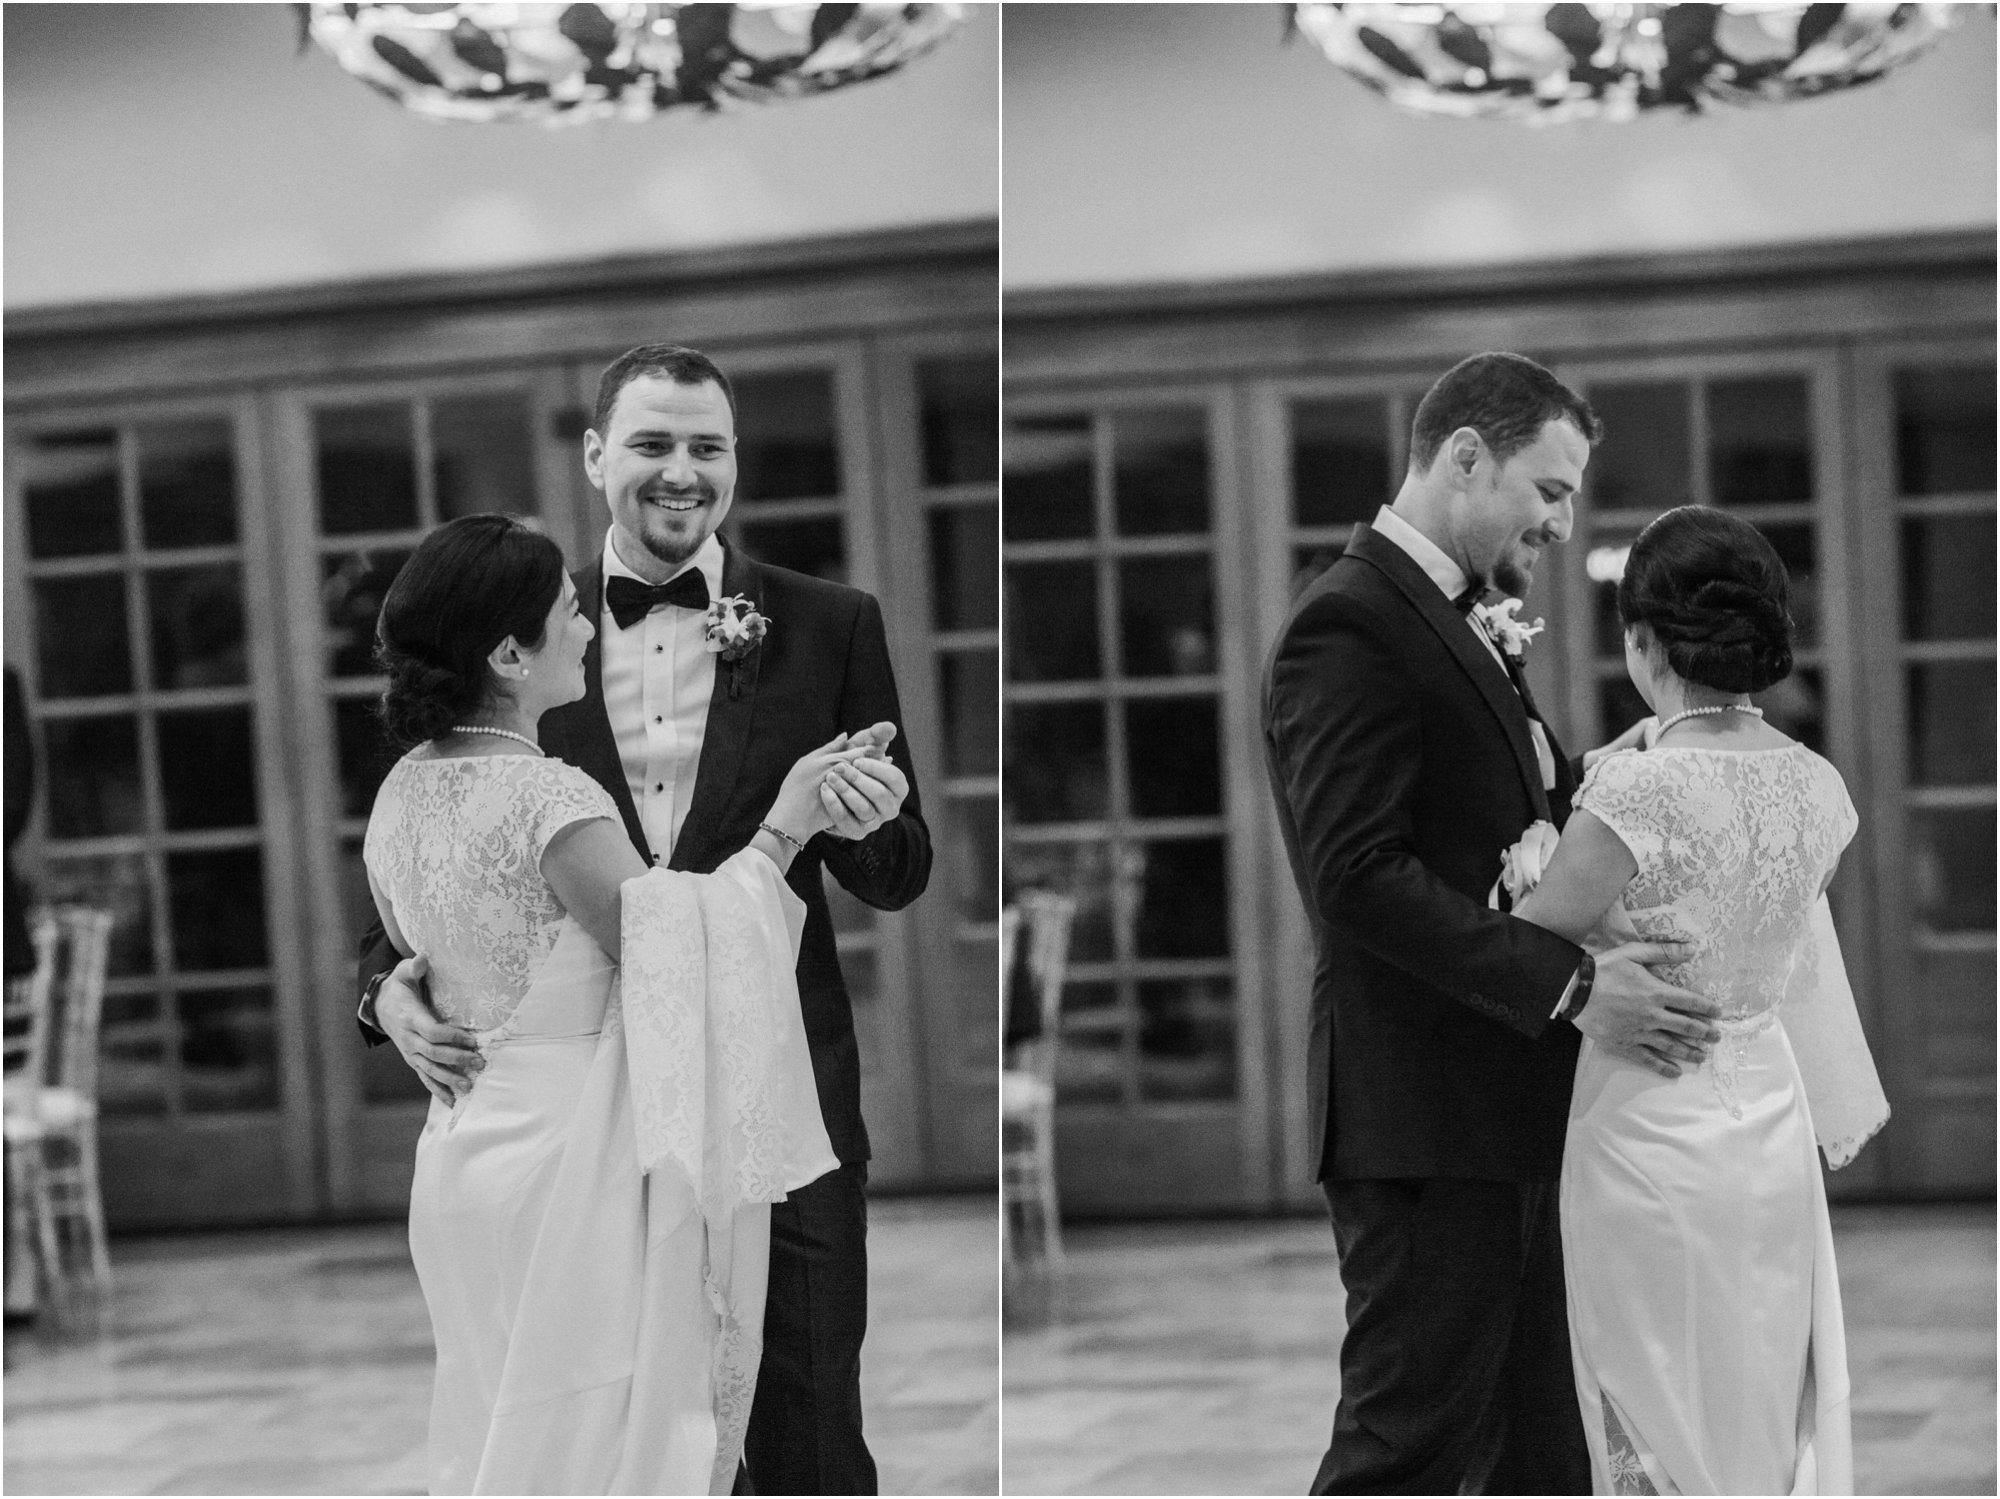 020Albuquerque wedding photographers_ Blue Rose Photography_ Santa Fe wedding photographers_ New Mexico Wedding photography